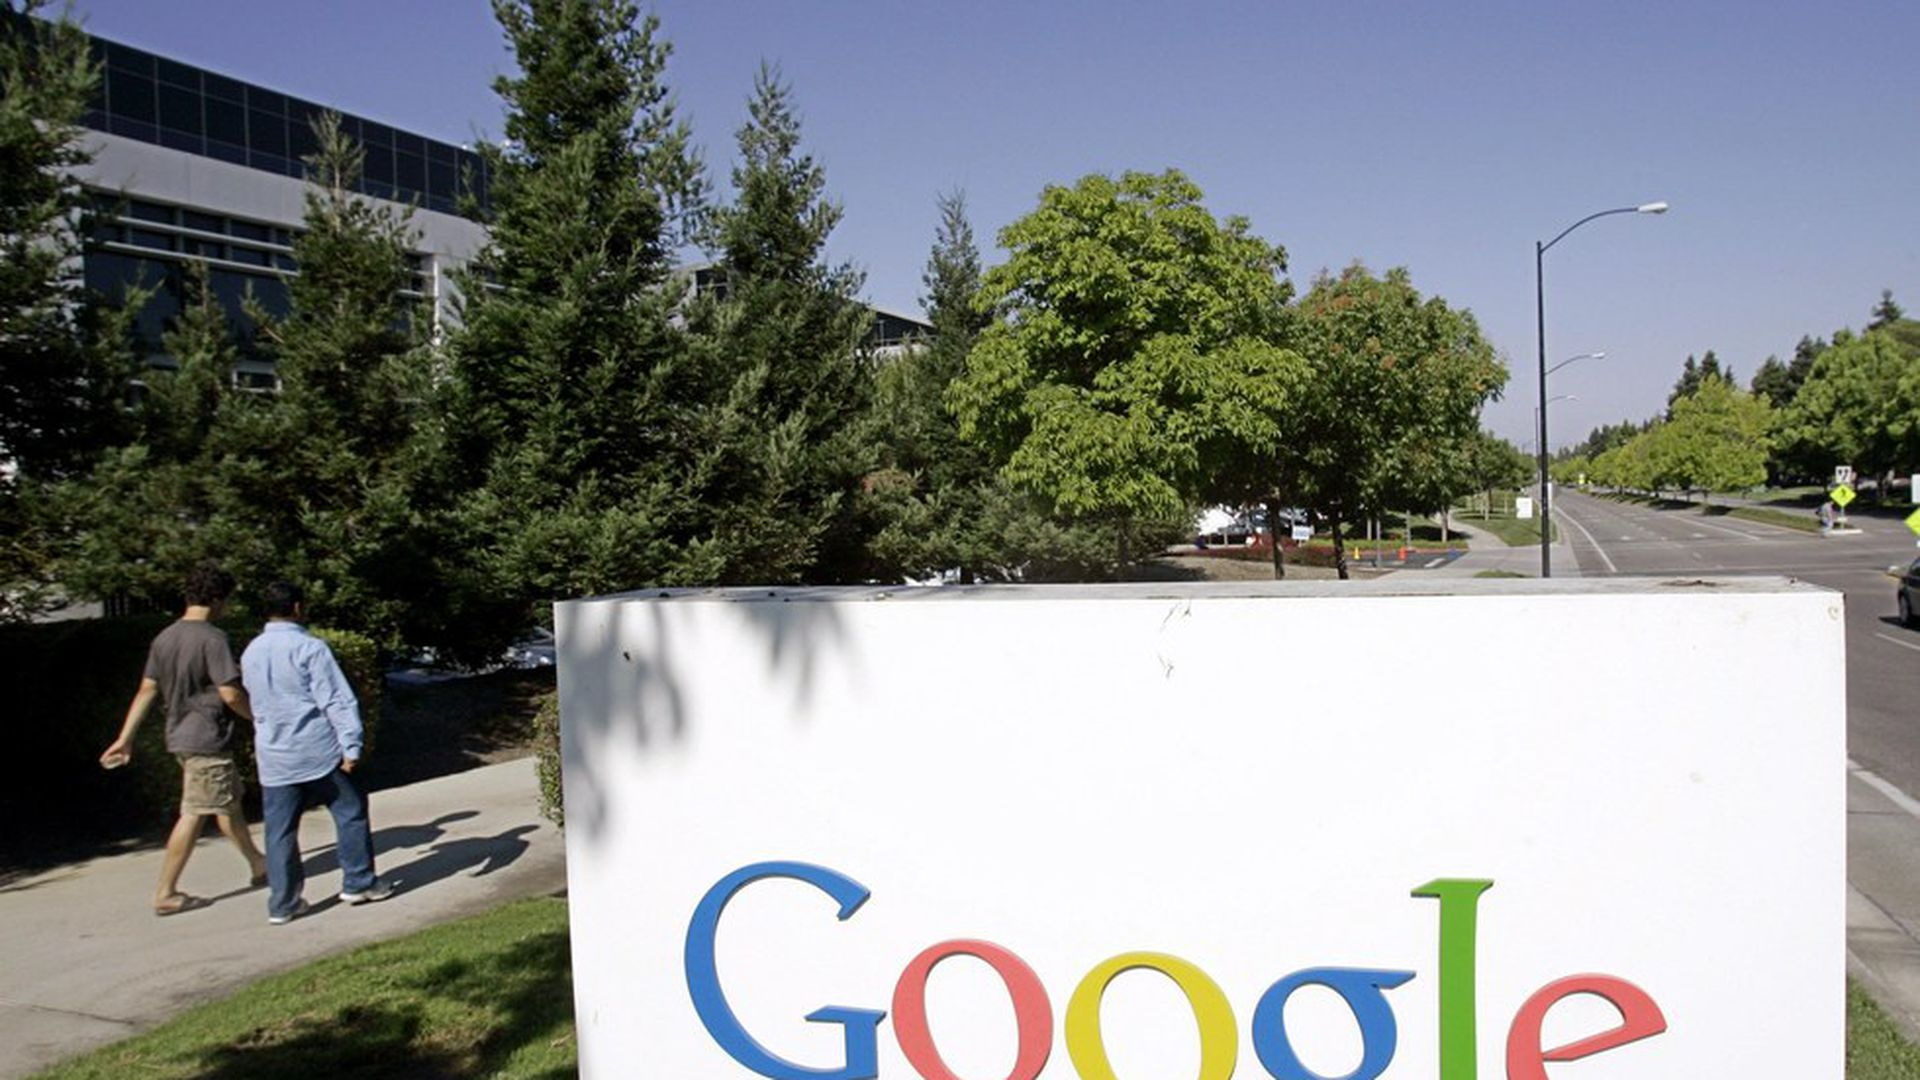 Exclusive: Google launches AI investment platform